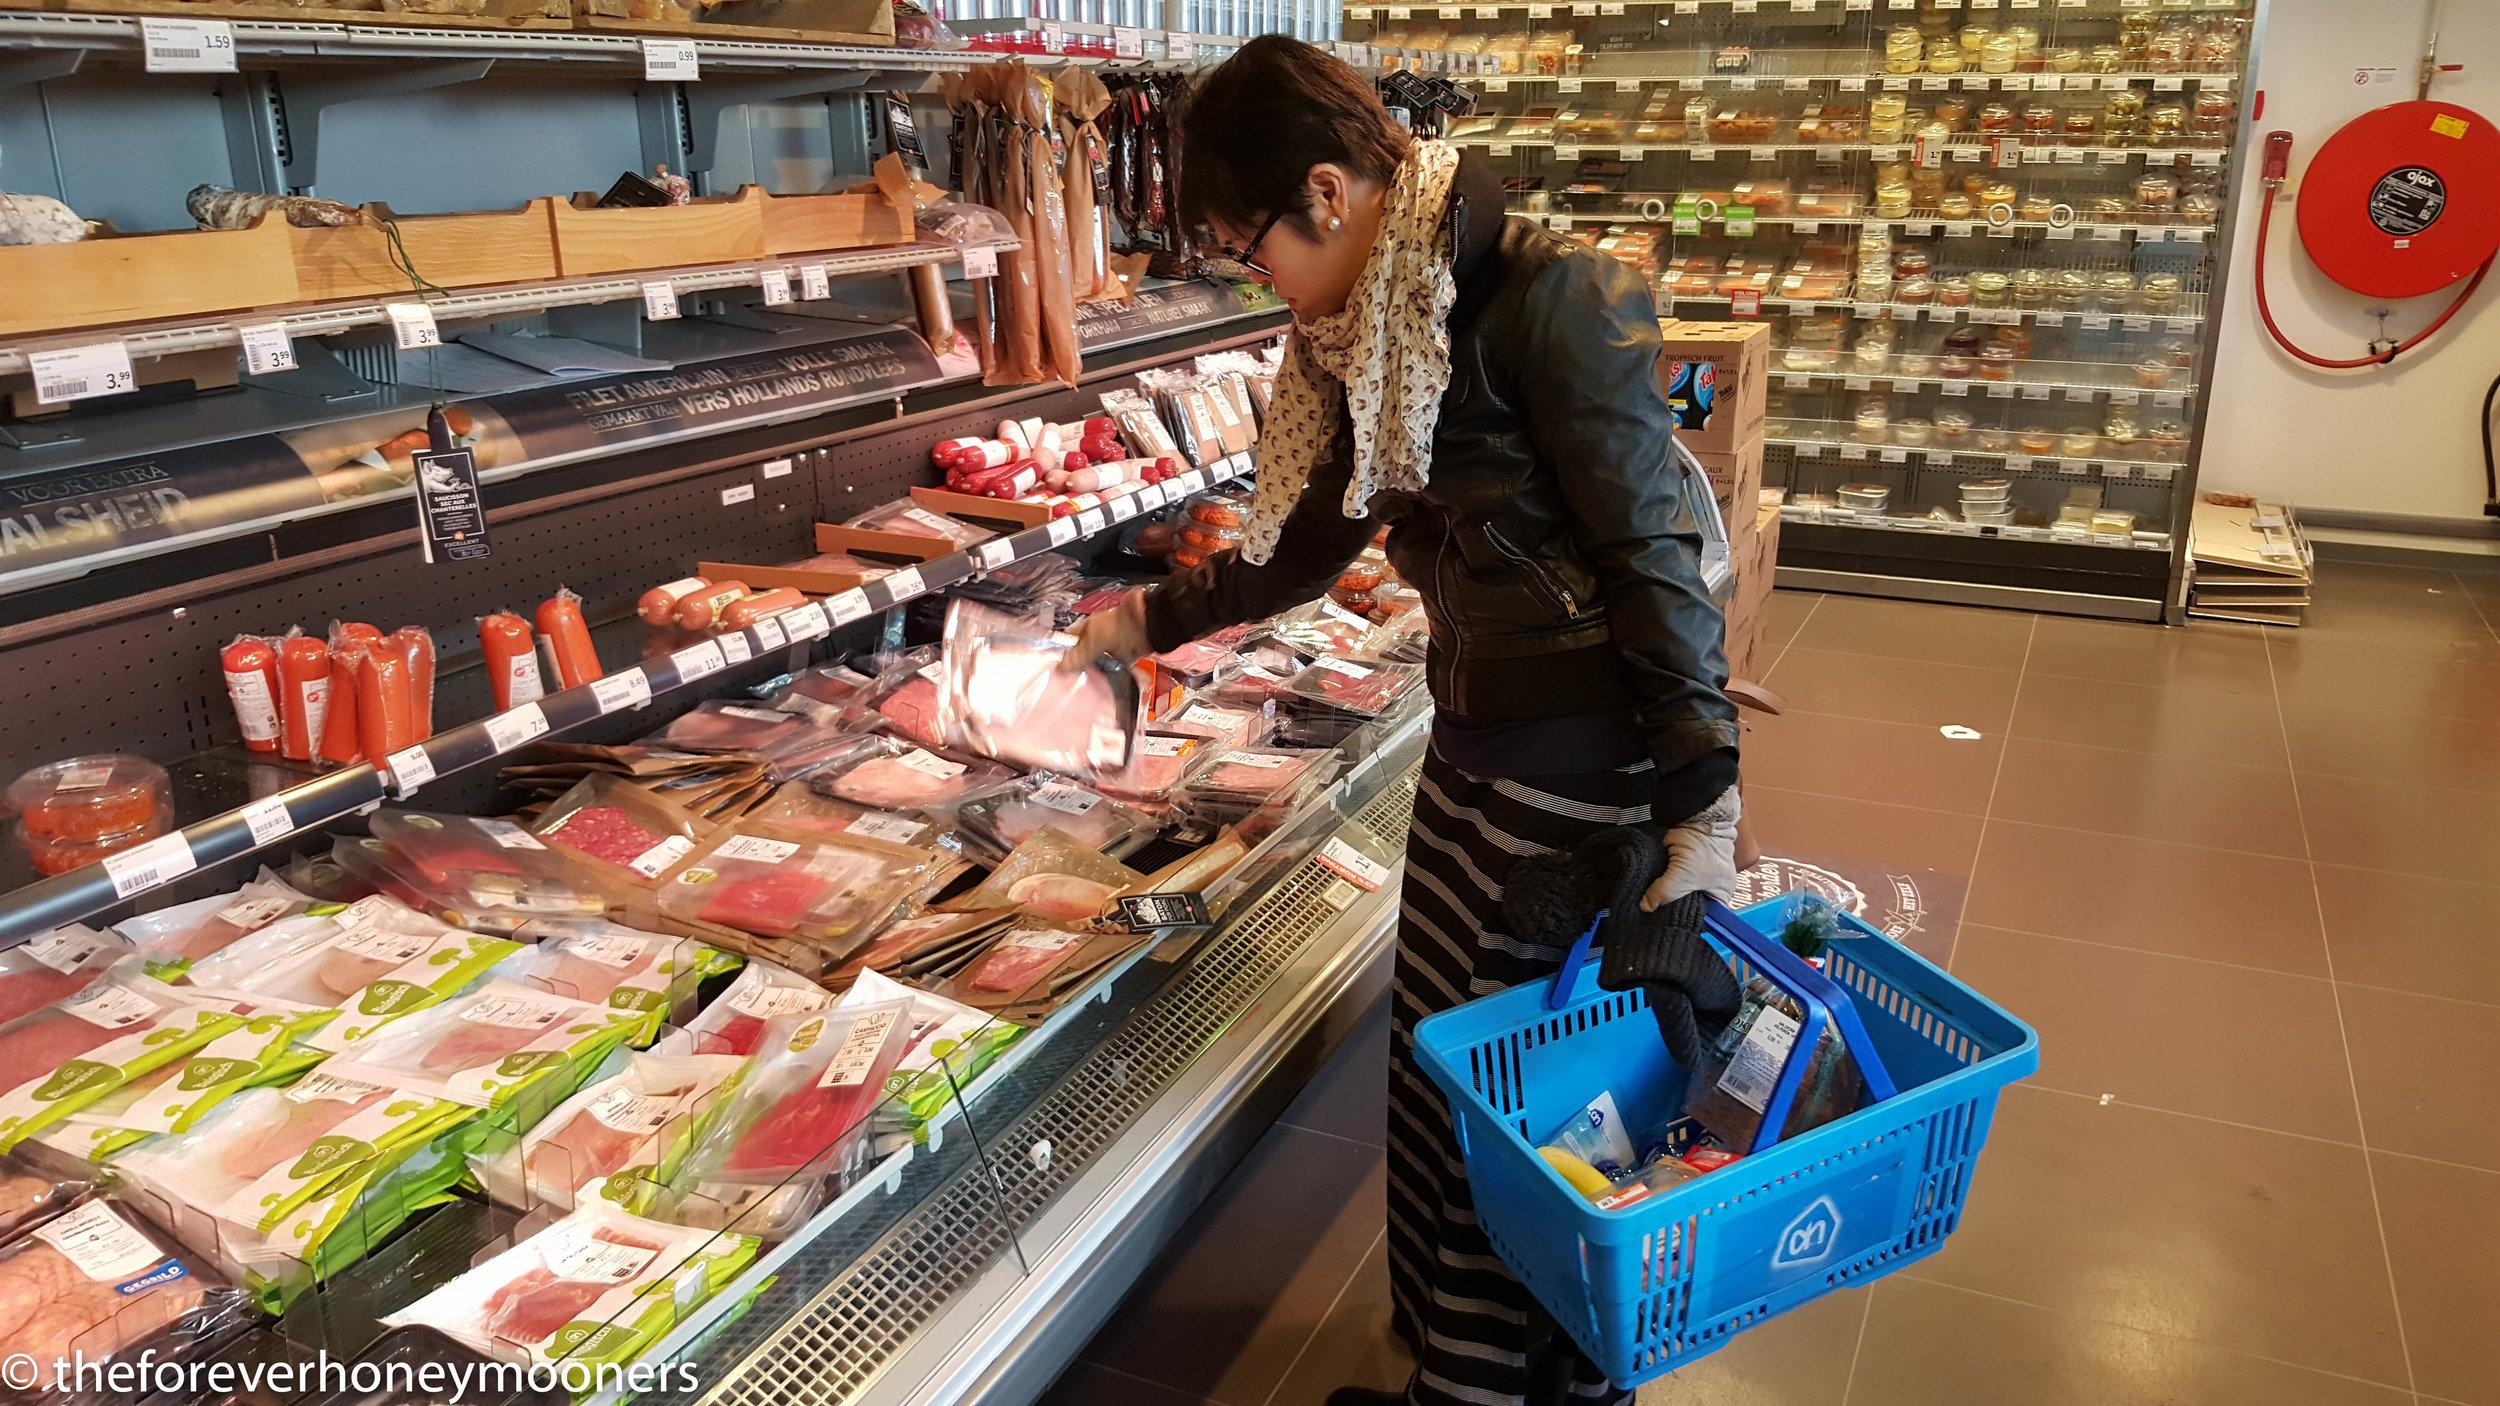 Grocery shopping for breakfast